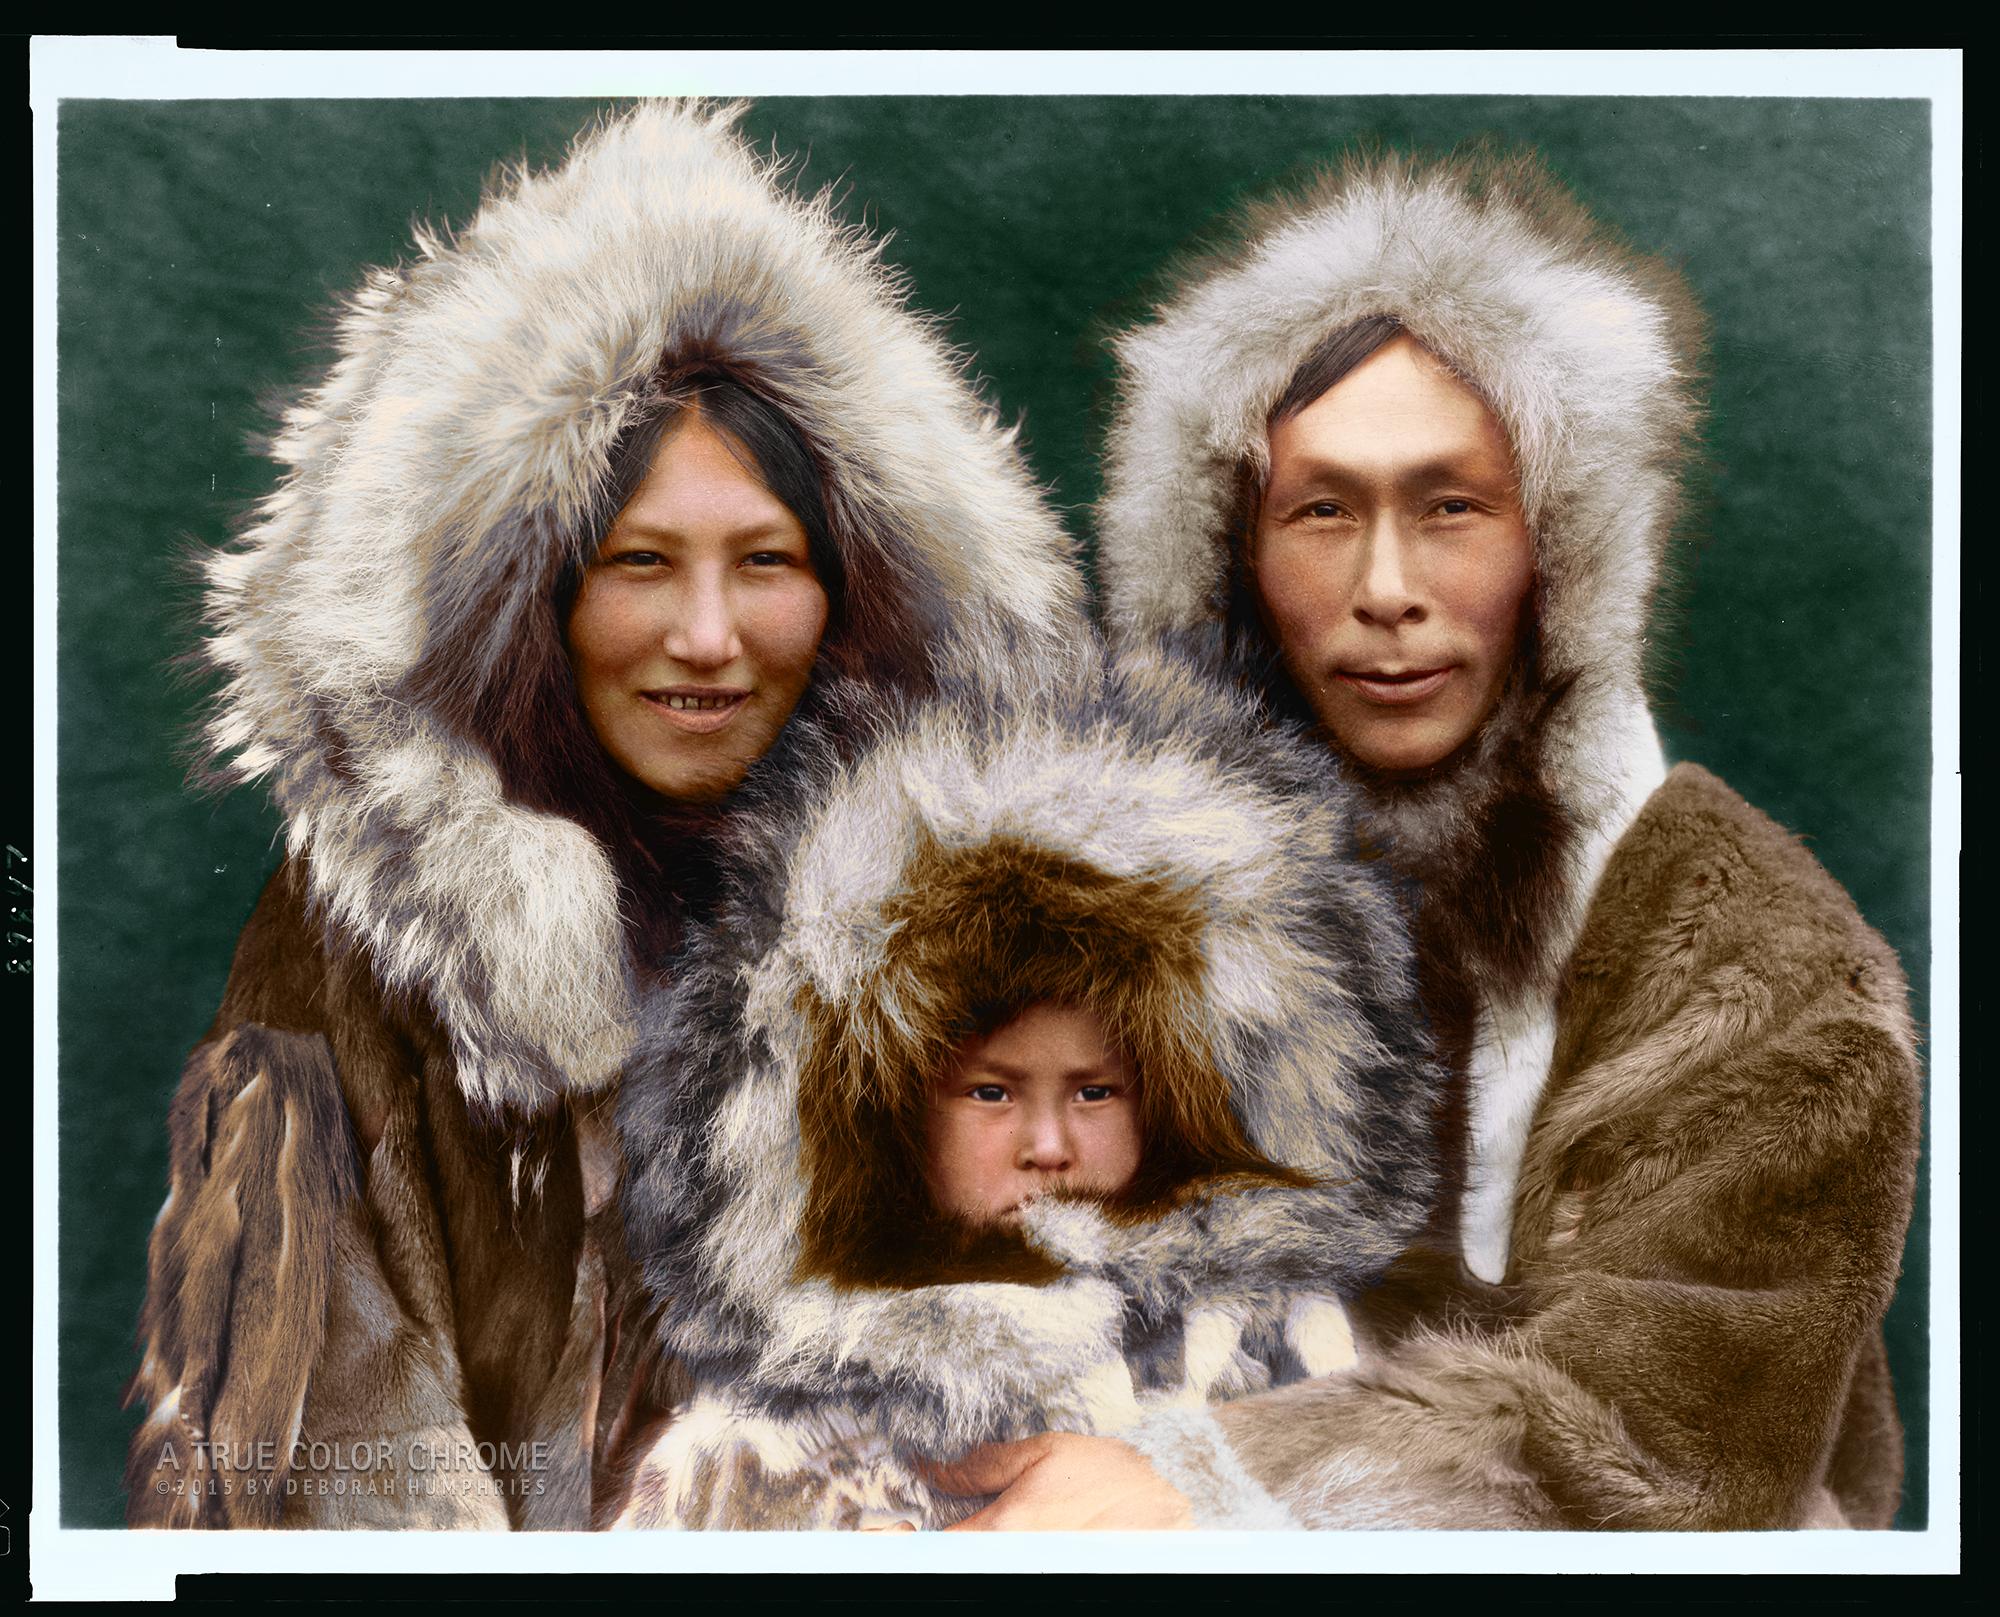 Ola, A family group Noatak, Edward S Curtis, c1929